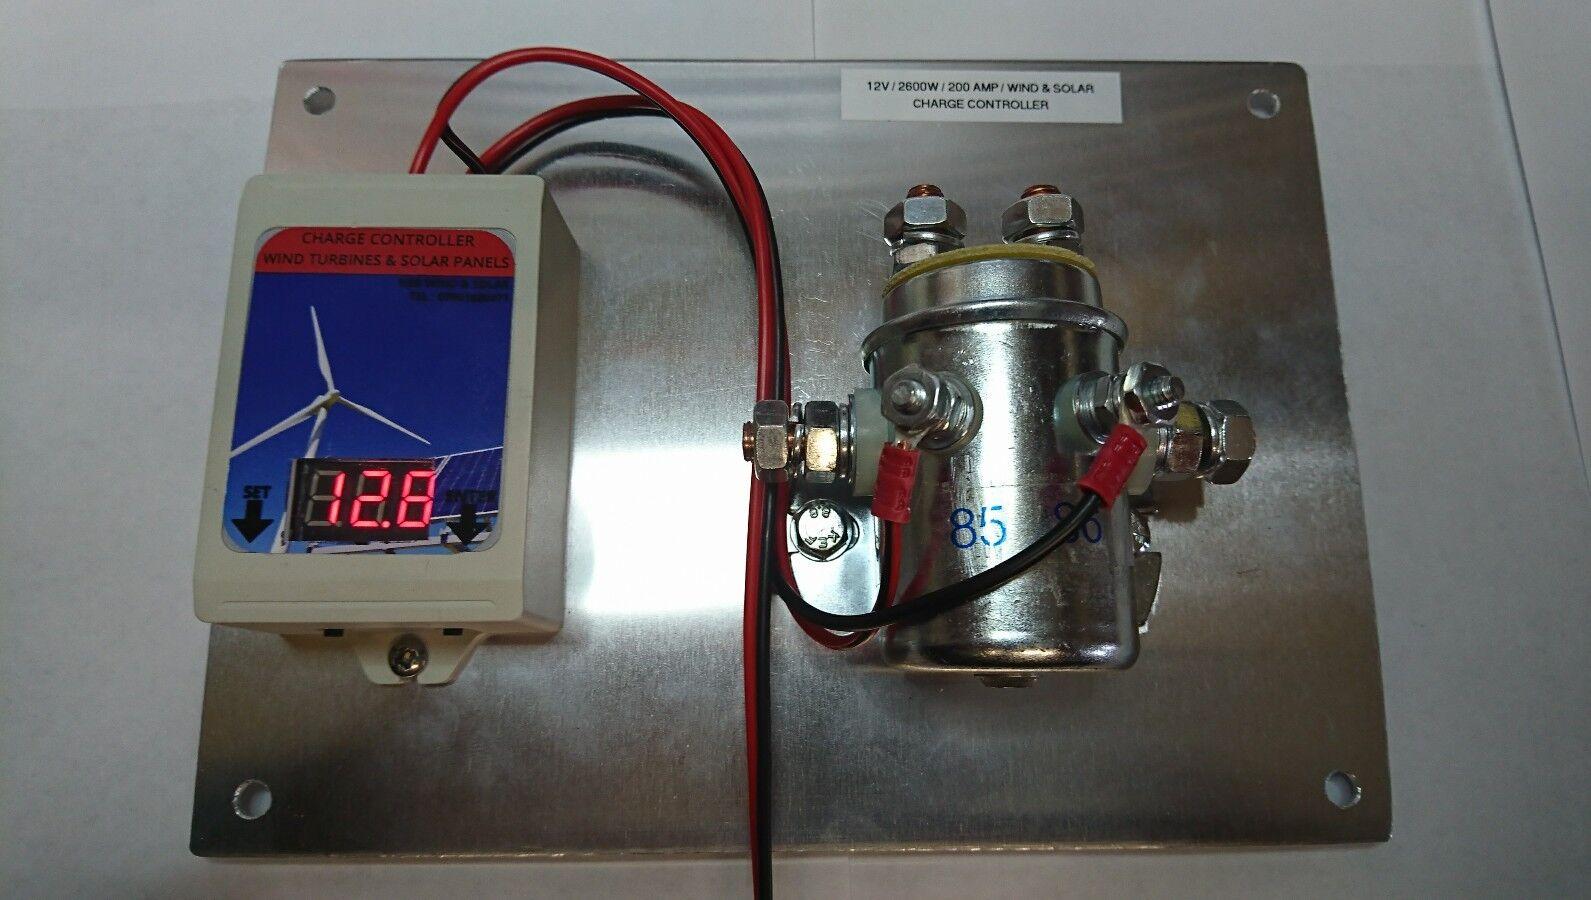 SOLAR / WIND TURBINE CHARGE CONTROLLER 12V,  200 AMP (2600 watts)